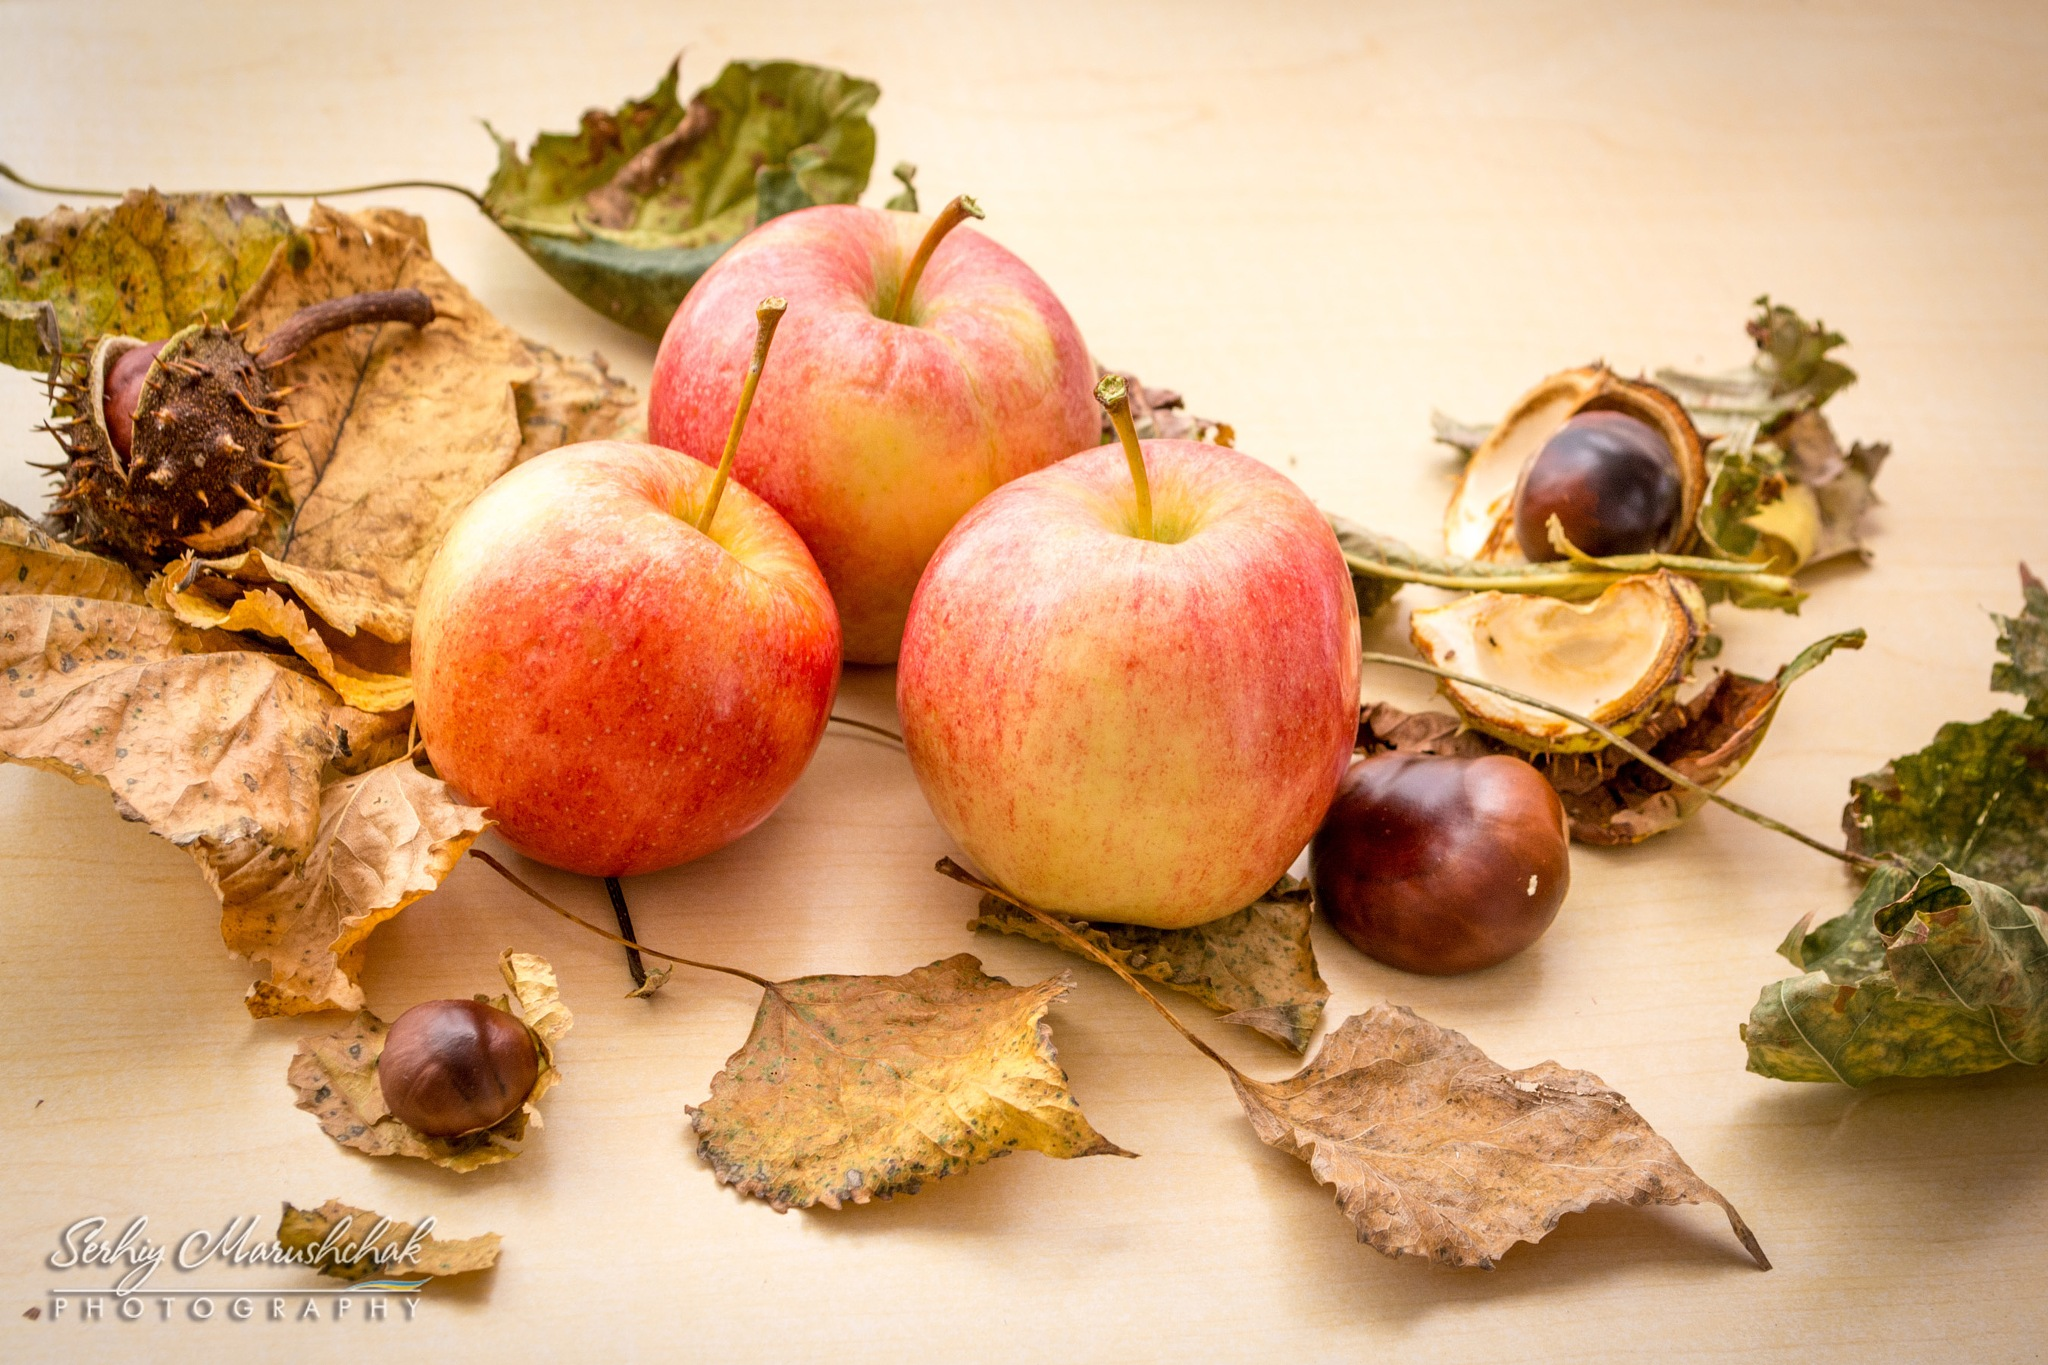 Осінні яблука... / Autumn apples... by artmars07